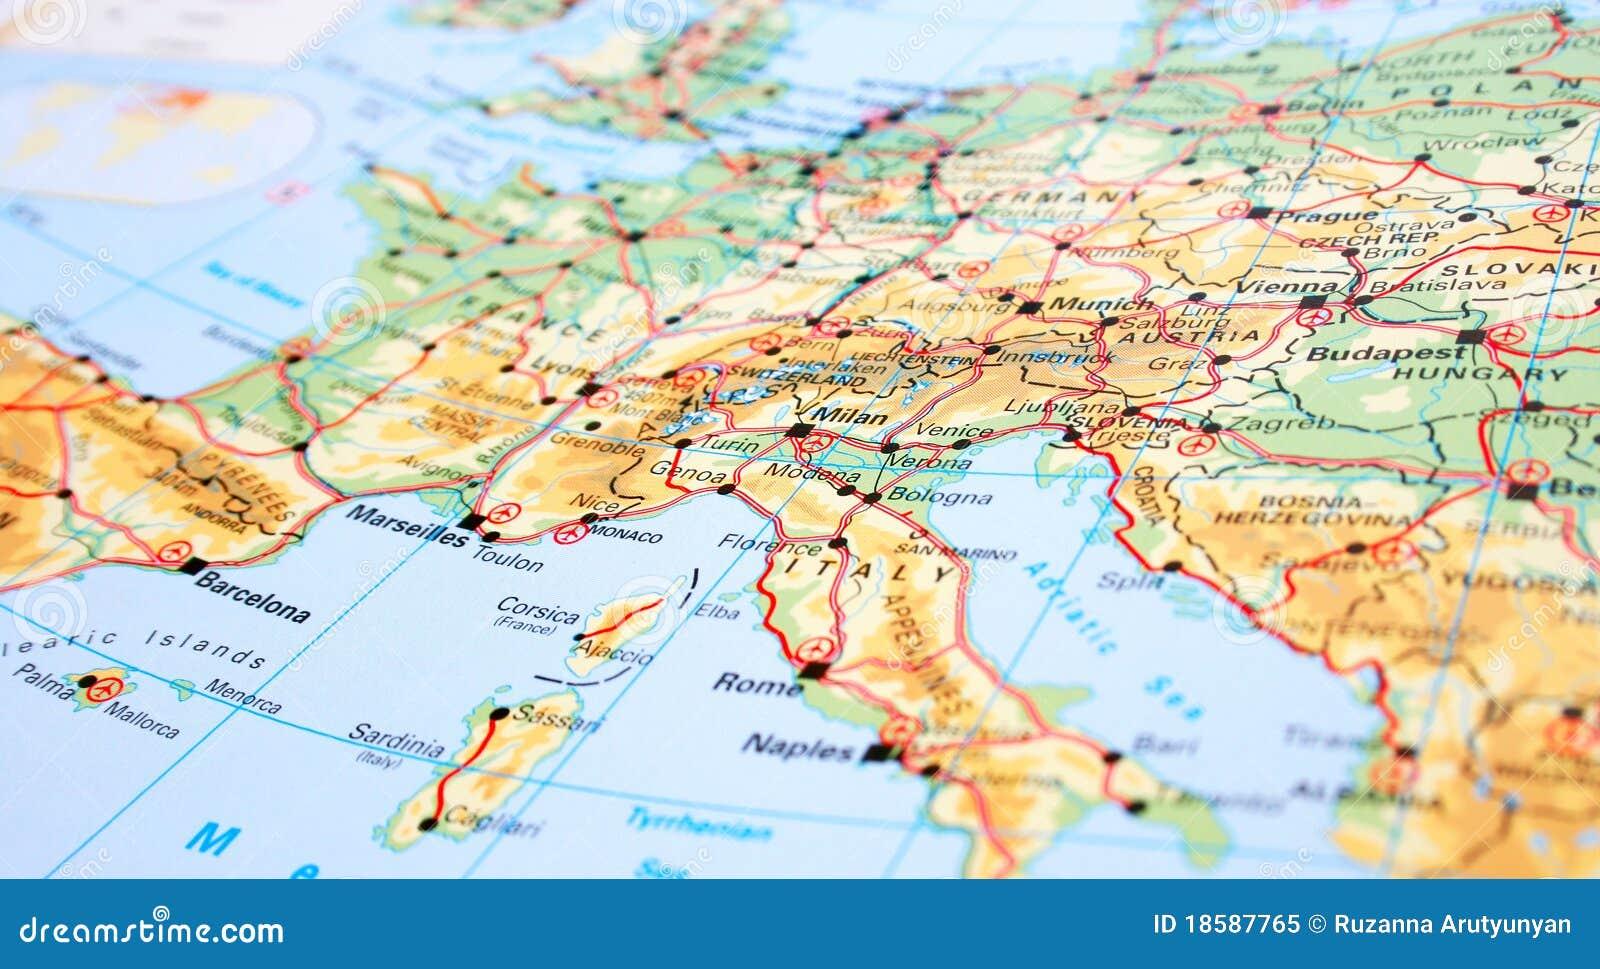 Europe Map Stock Image Image Of Colorful Illustration 18587765